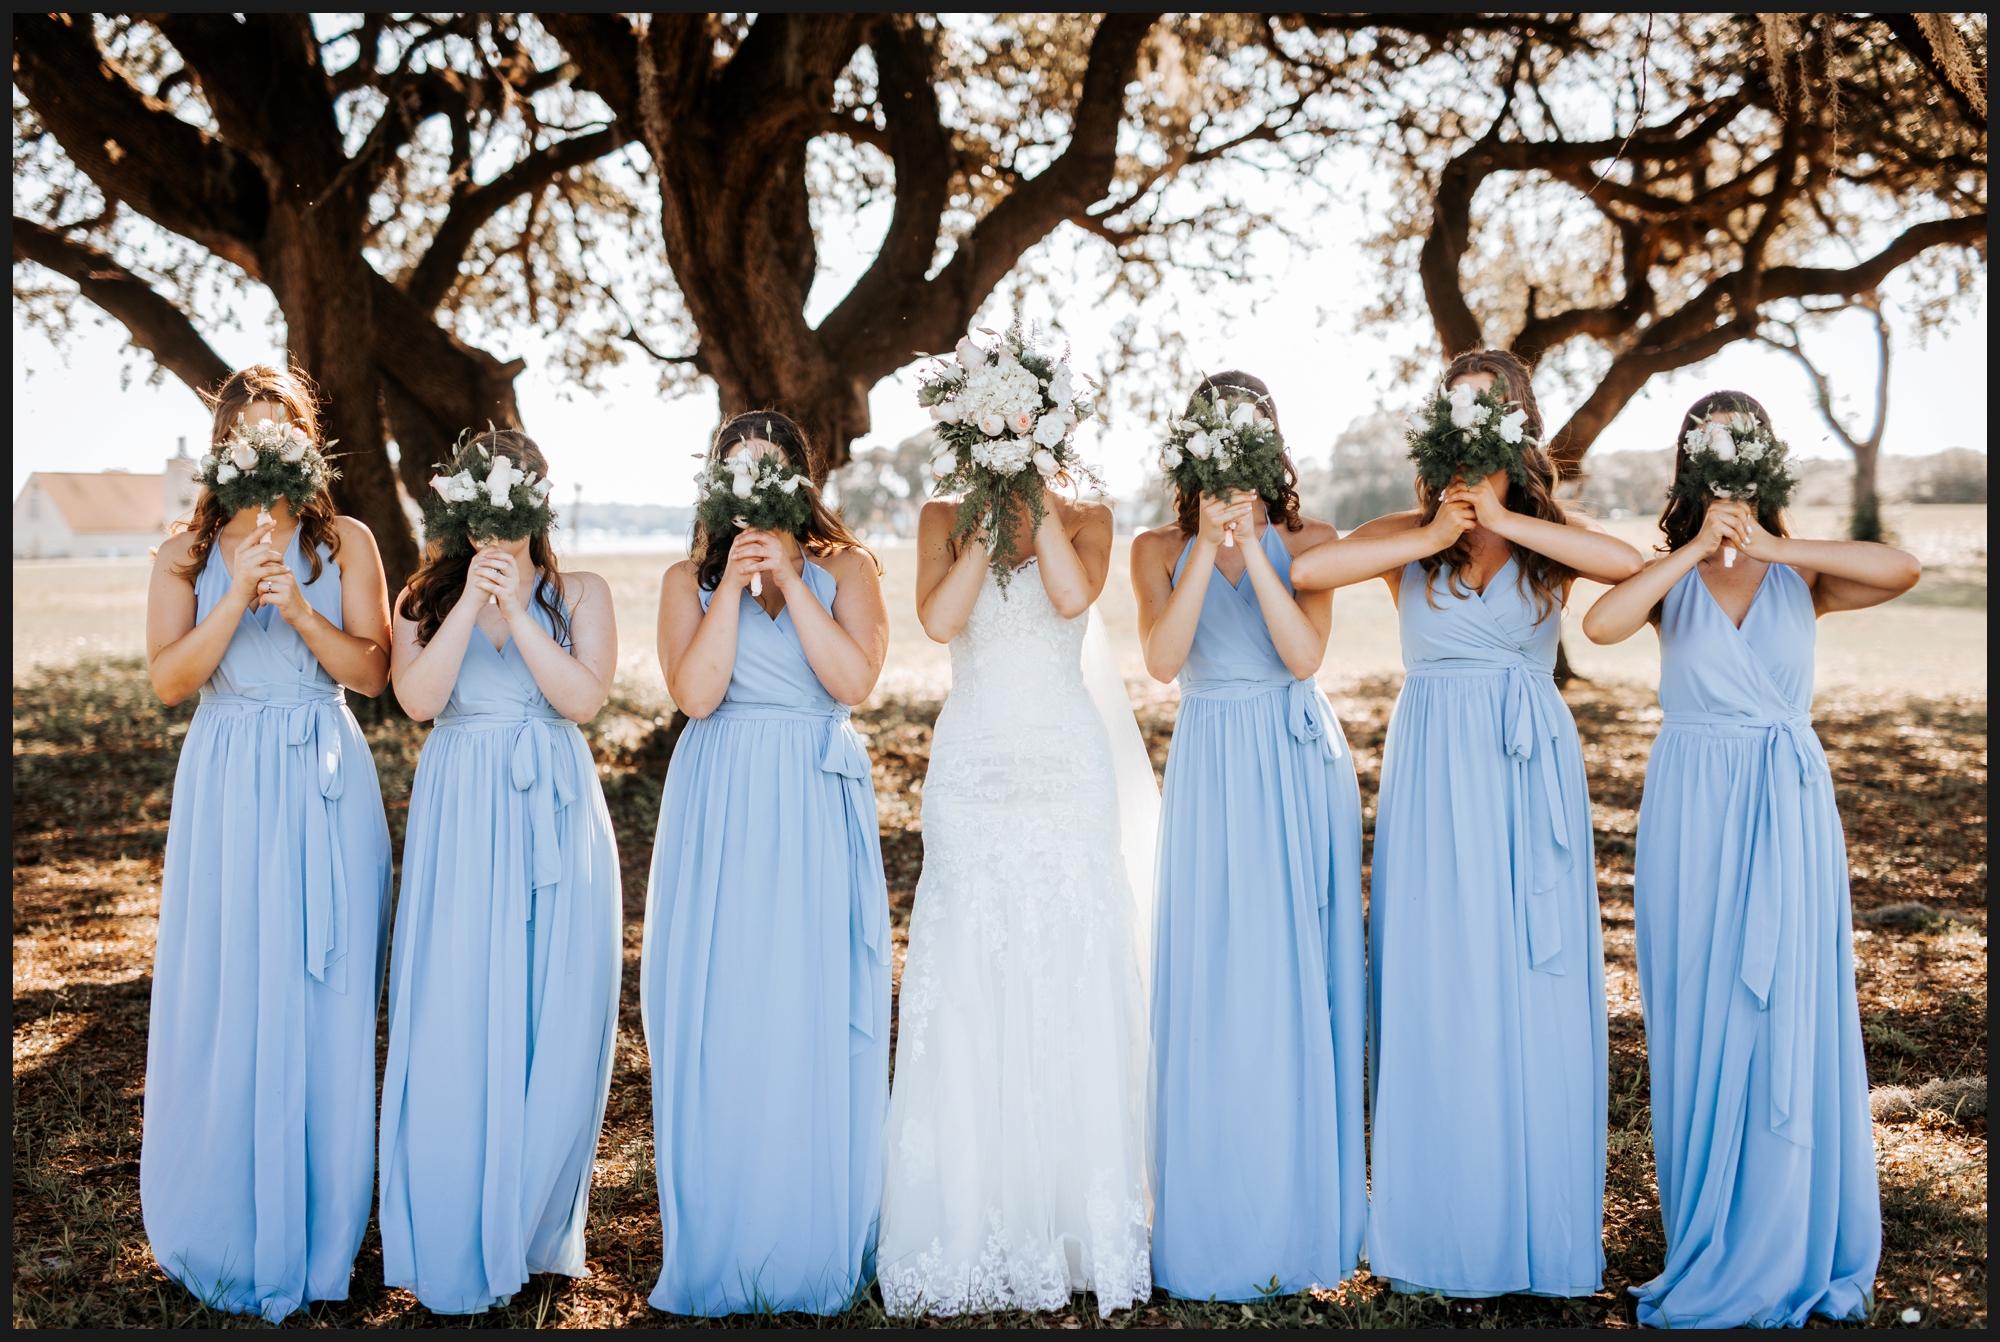 Orlando-Wedding-Photographer-destination-wedding-photographer-florida-wedding-photographer-bohemian-wedding-photographer_0084.jpg